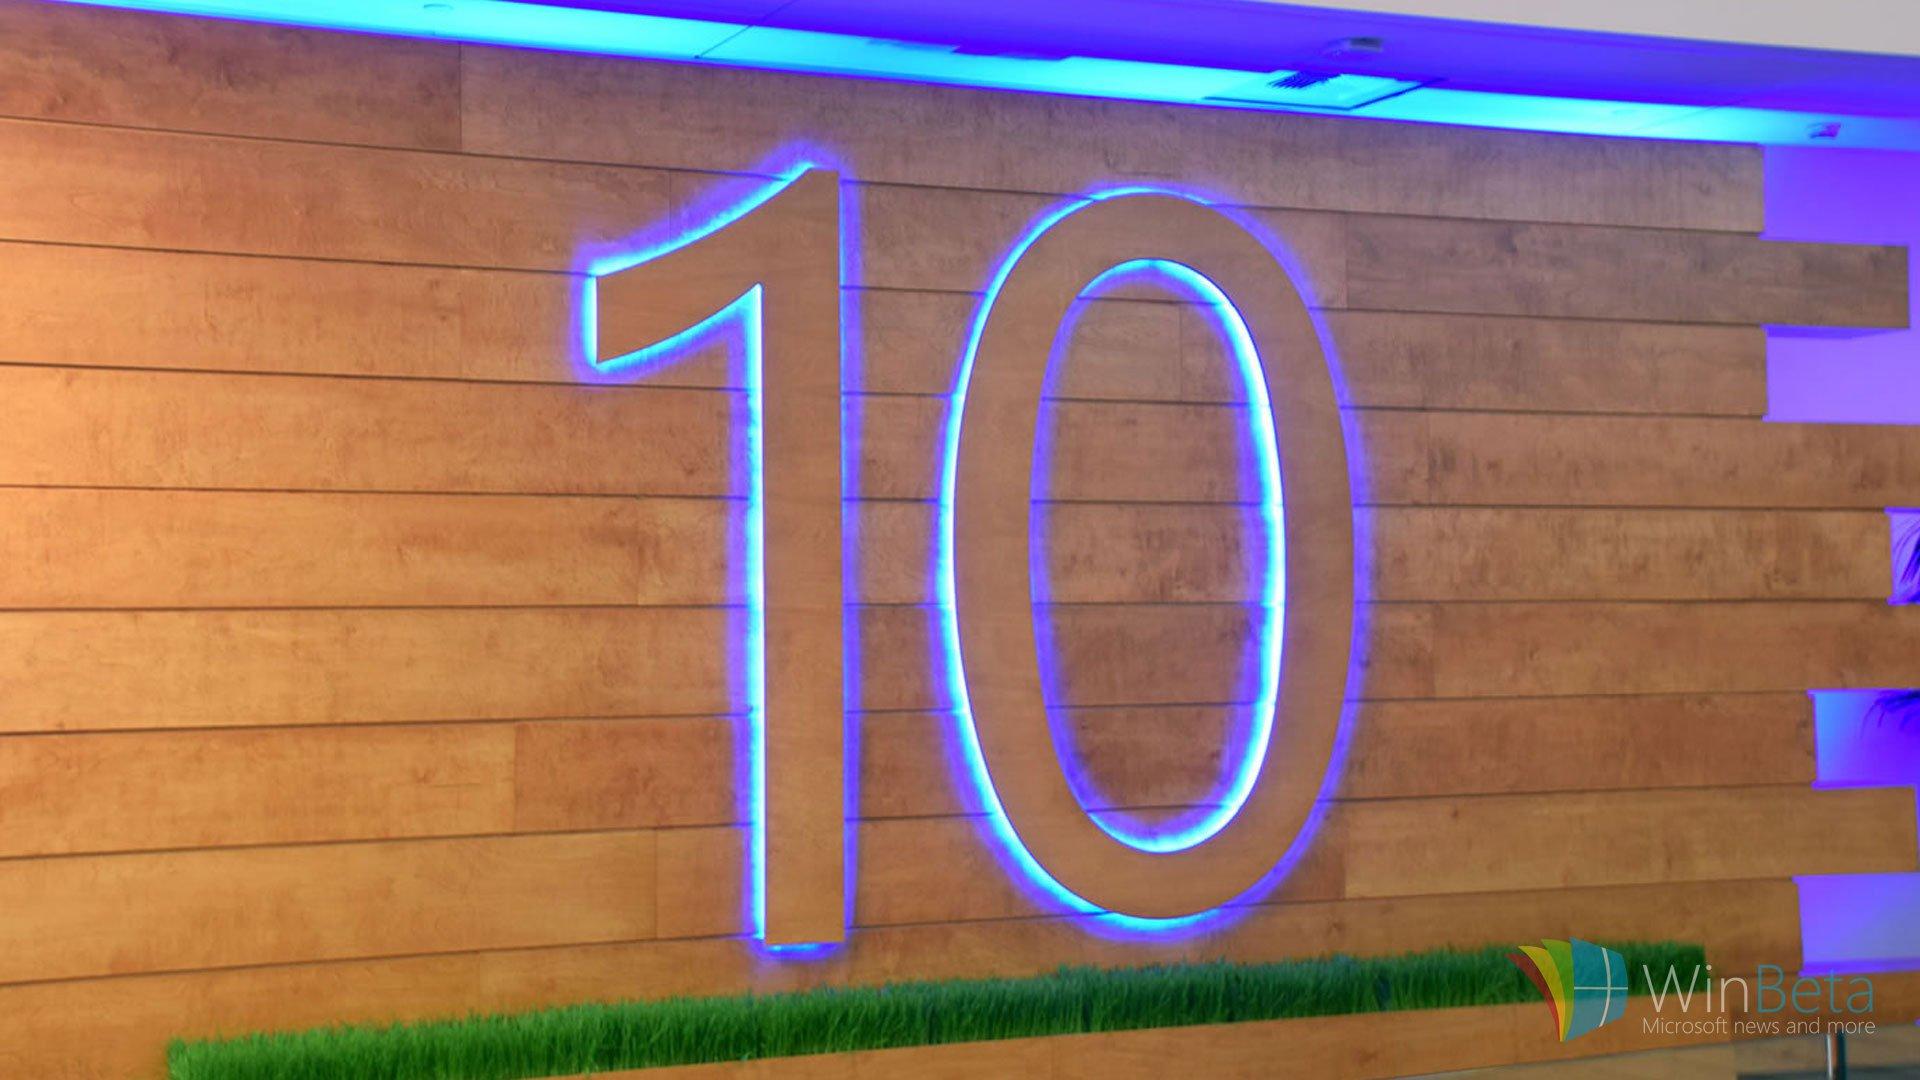 Mac Pro Fall Wallpaper 2017 Windows 10 Wallpaper 1080p Full Hd Illuminated Wooden 10